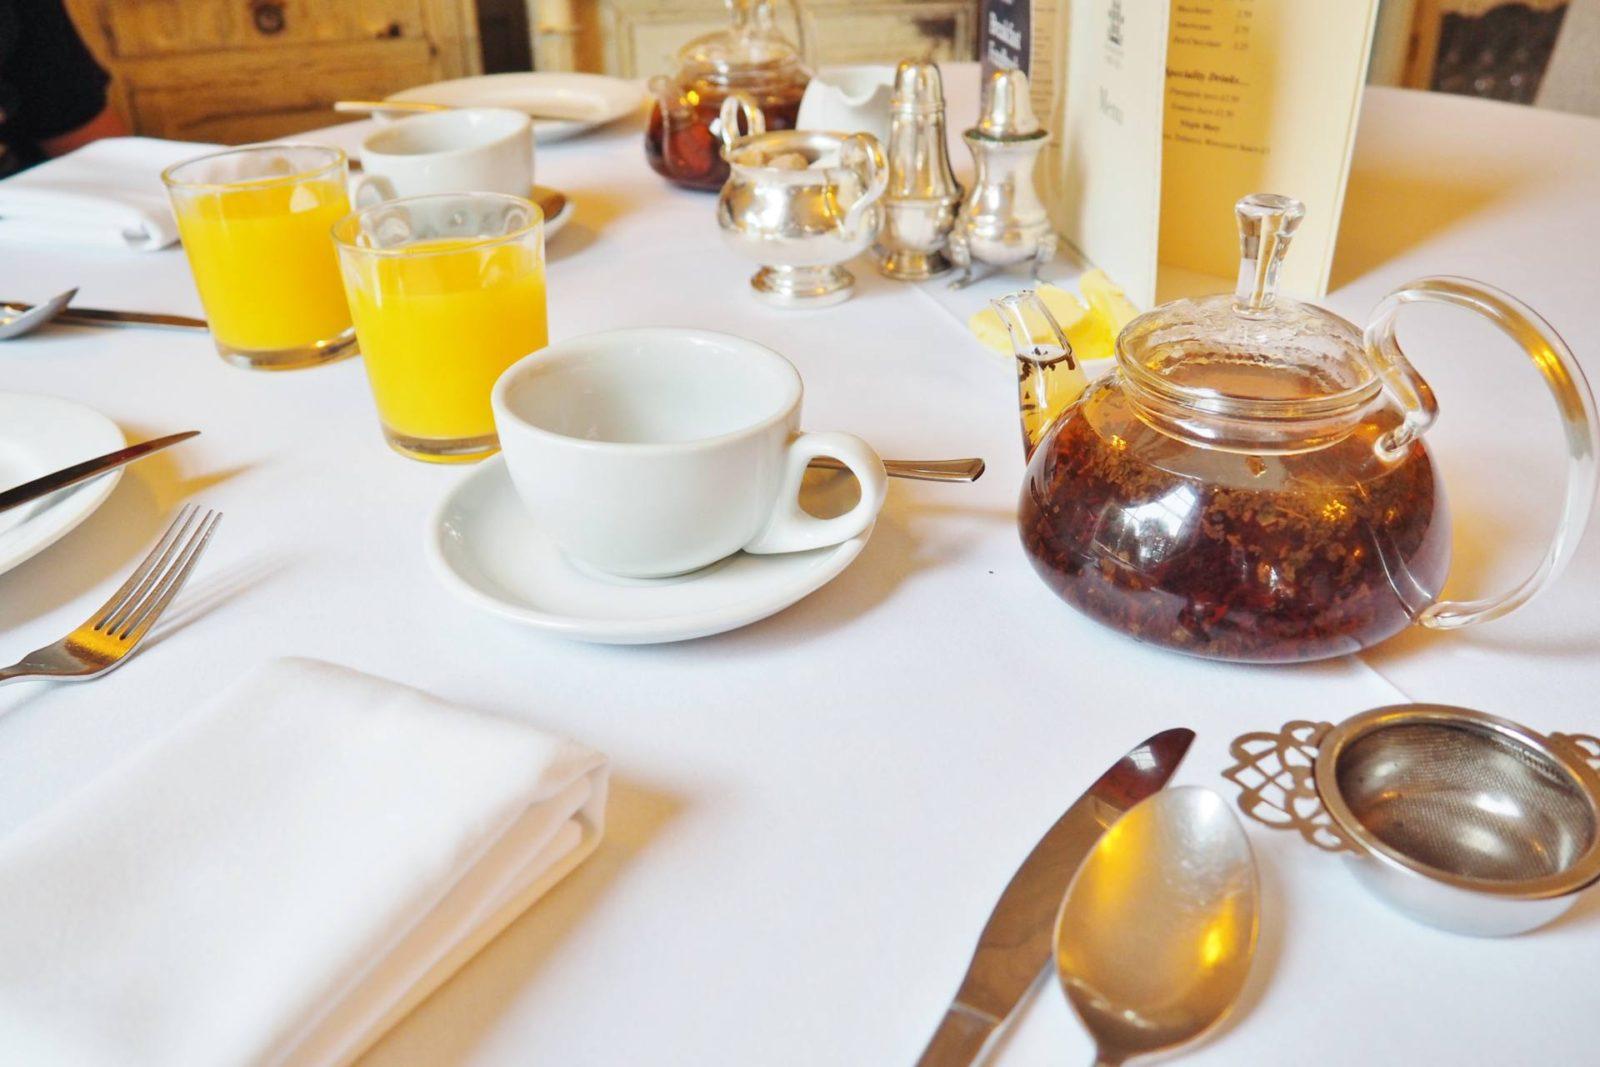 Netherstow-House-Lichfield-Breakfast